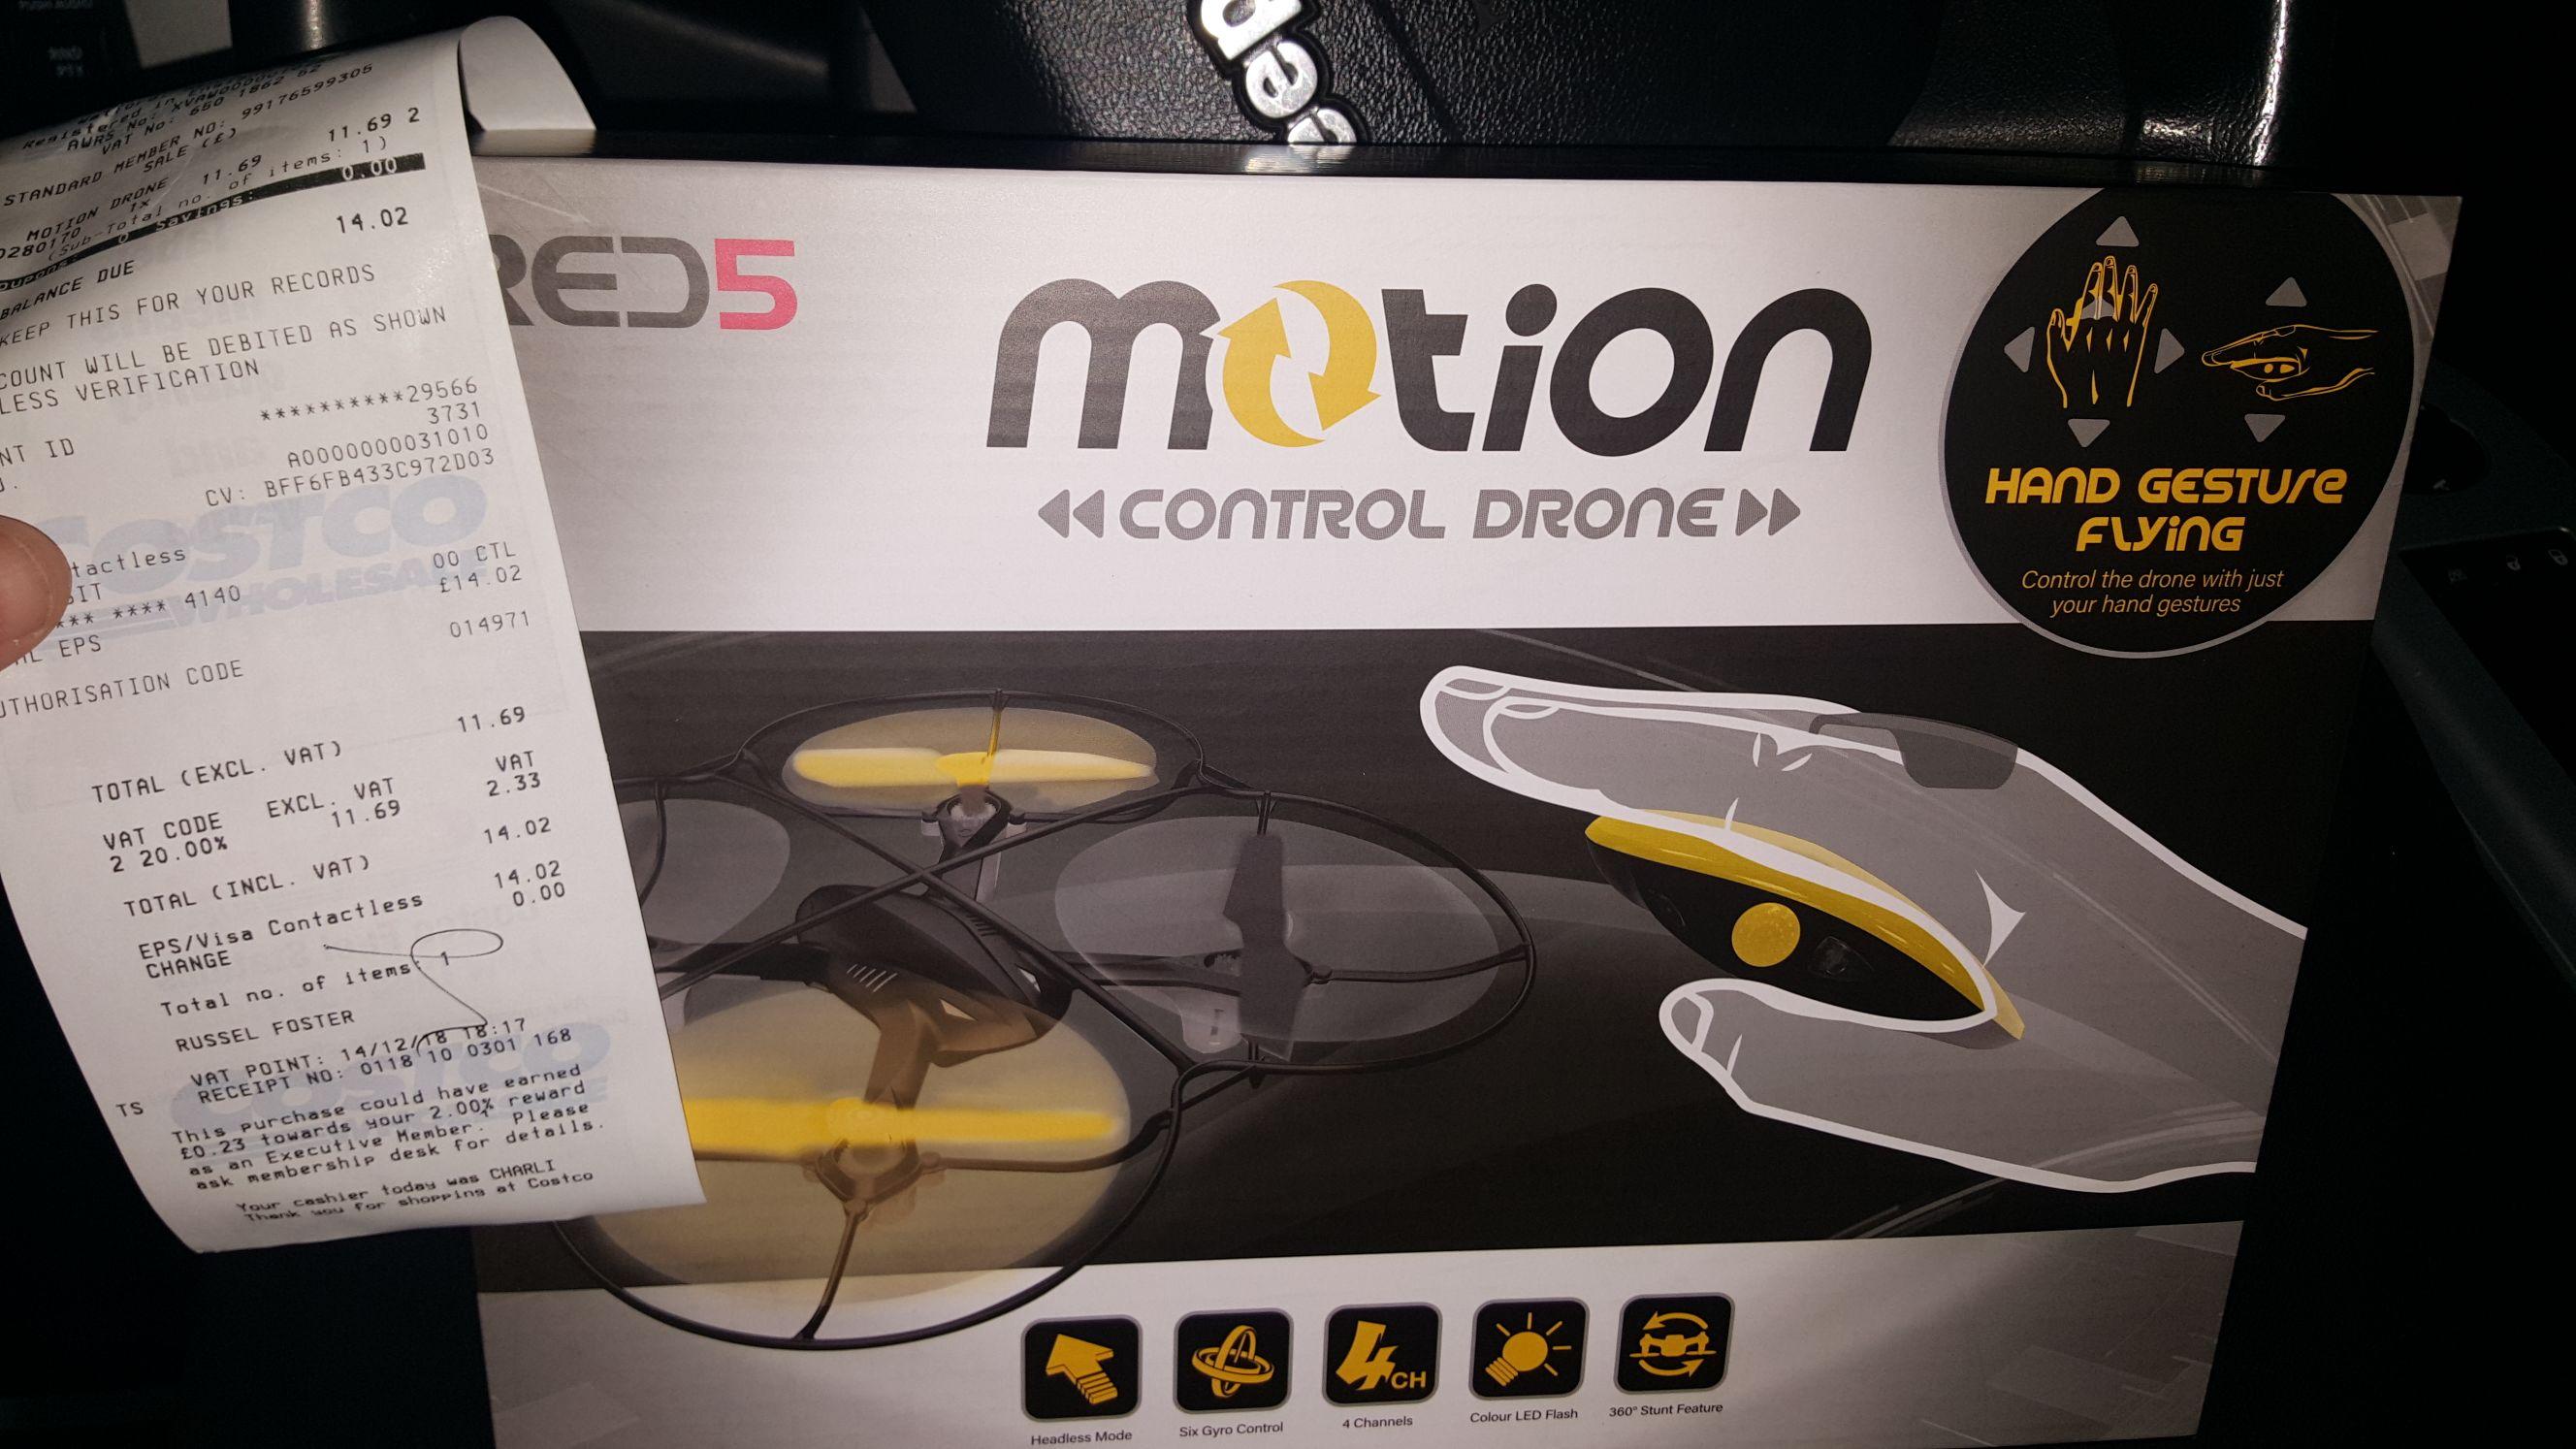 COSTCO Sheffield red5 motion control drone £14.02